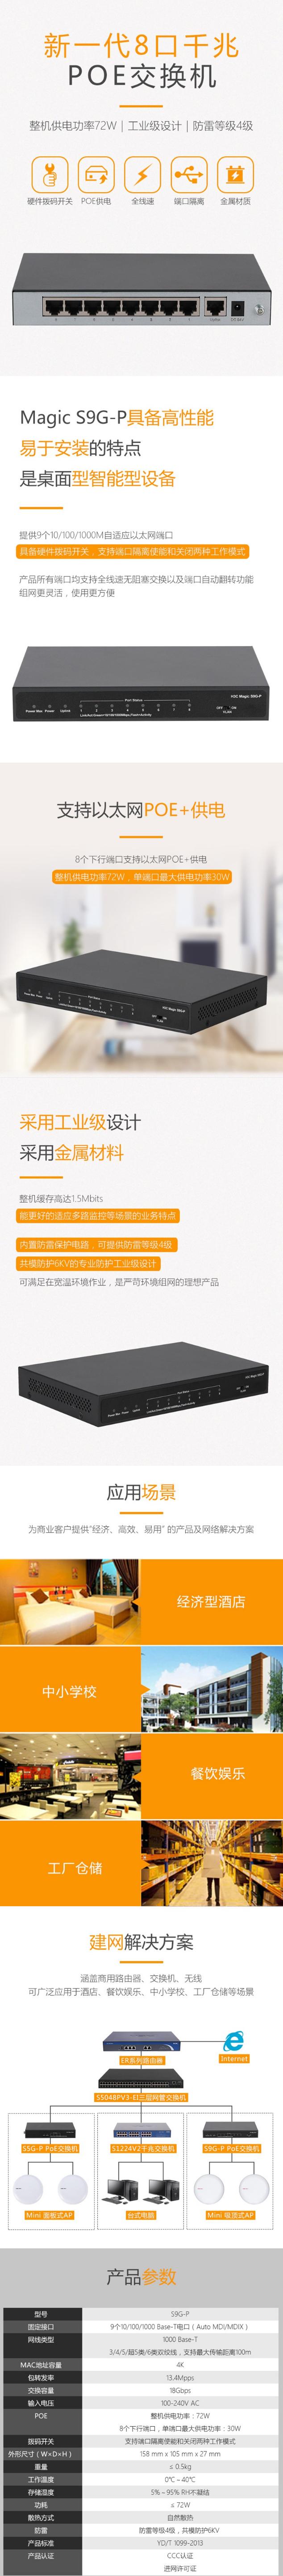 S9G-P 千兆POE交换机